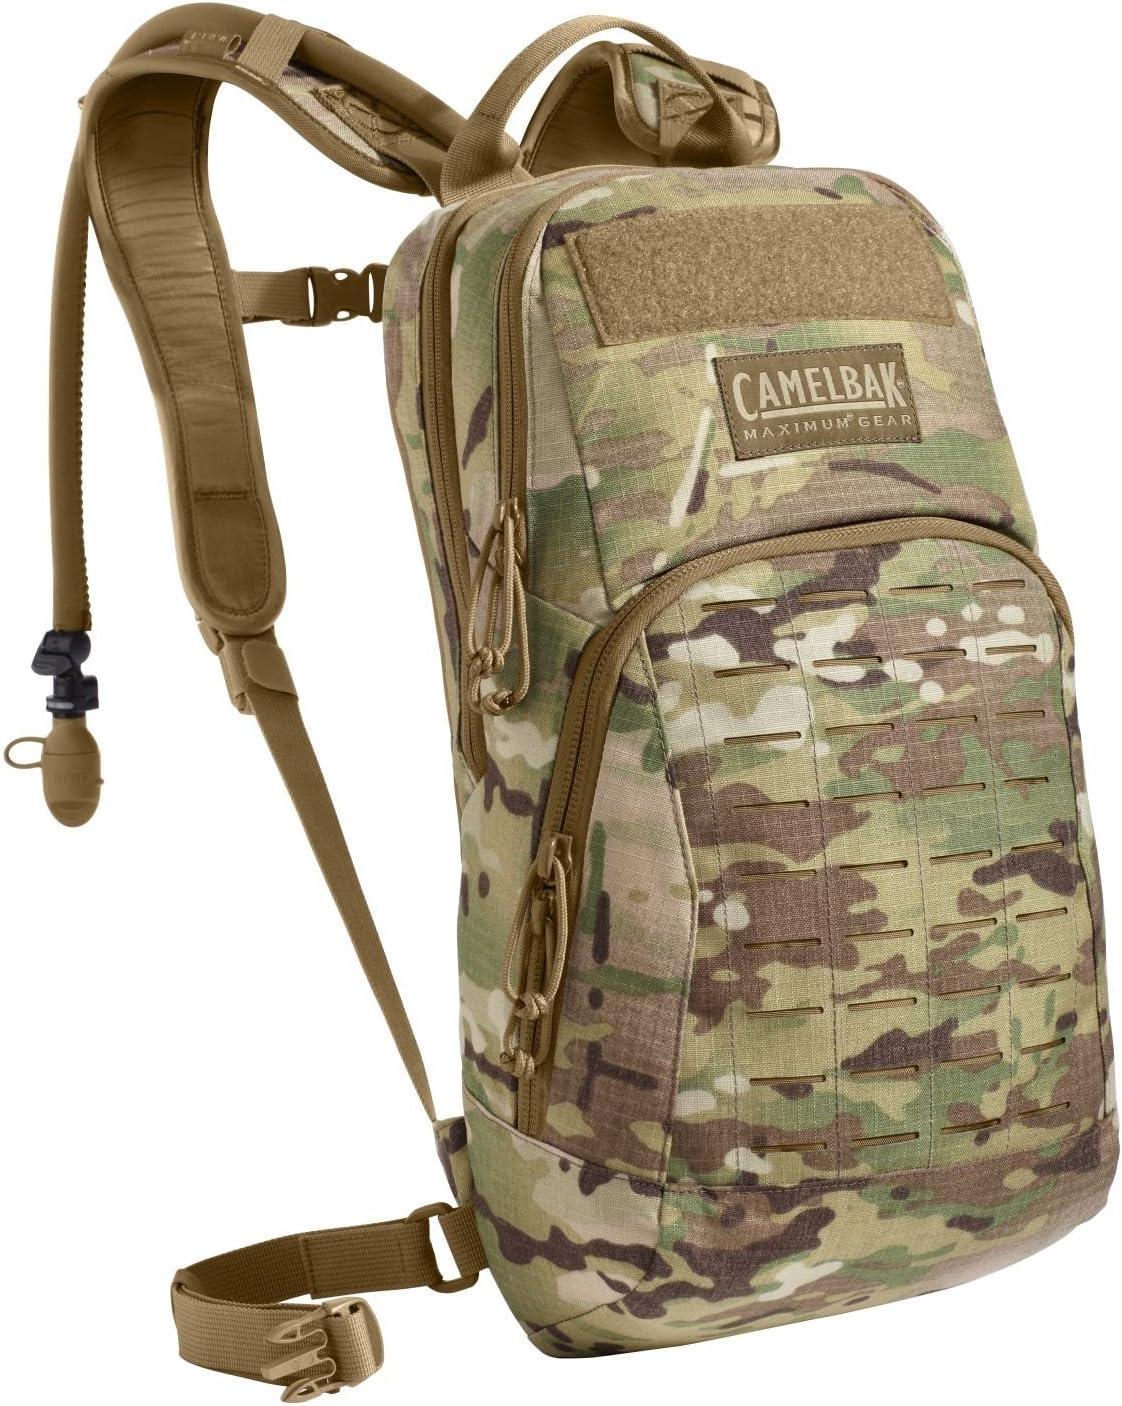 Camelbak MULE Military Hydration Pack by Camelbak